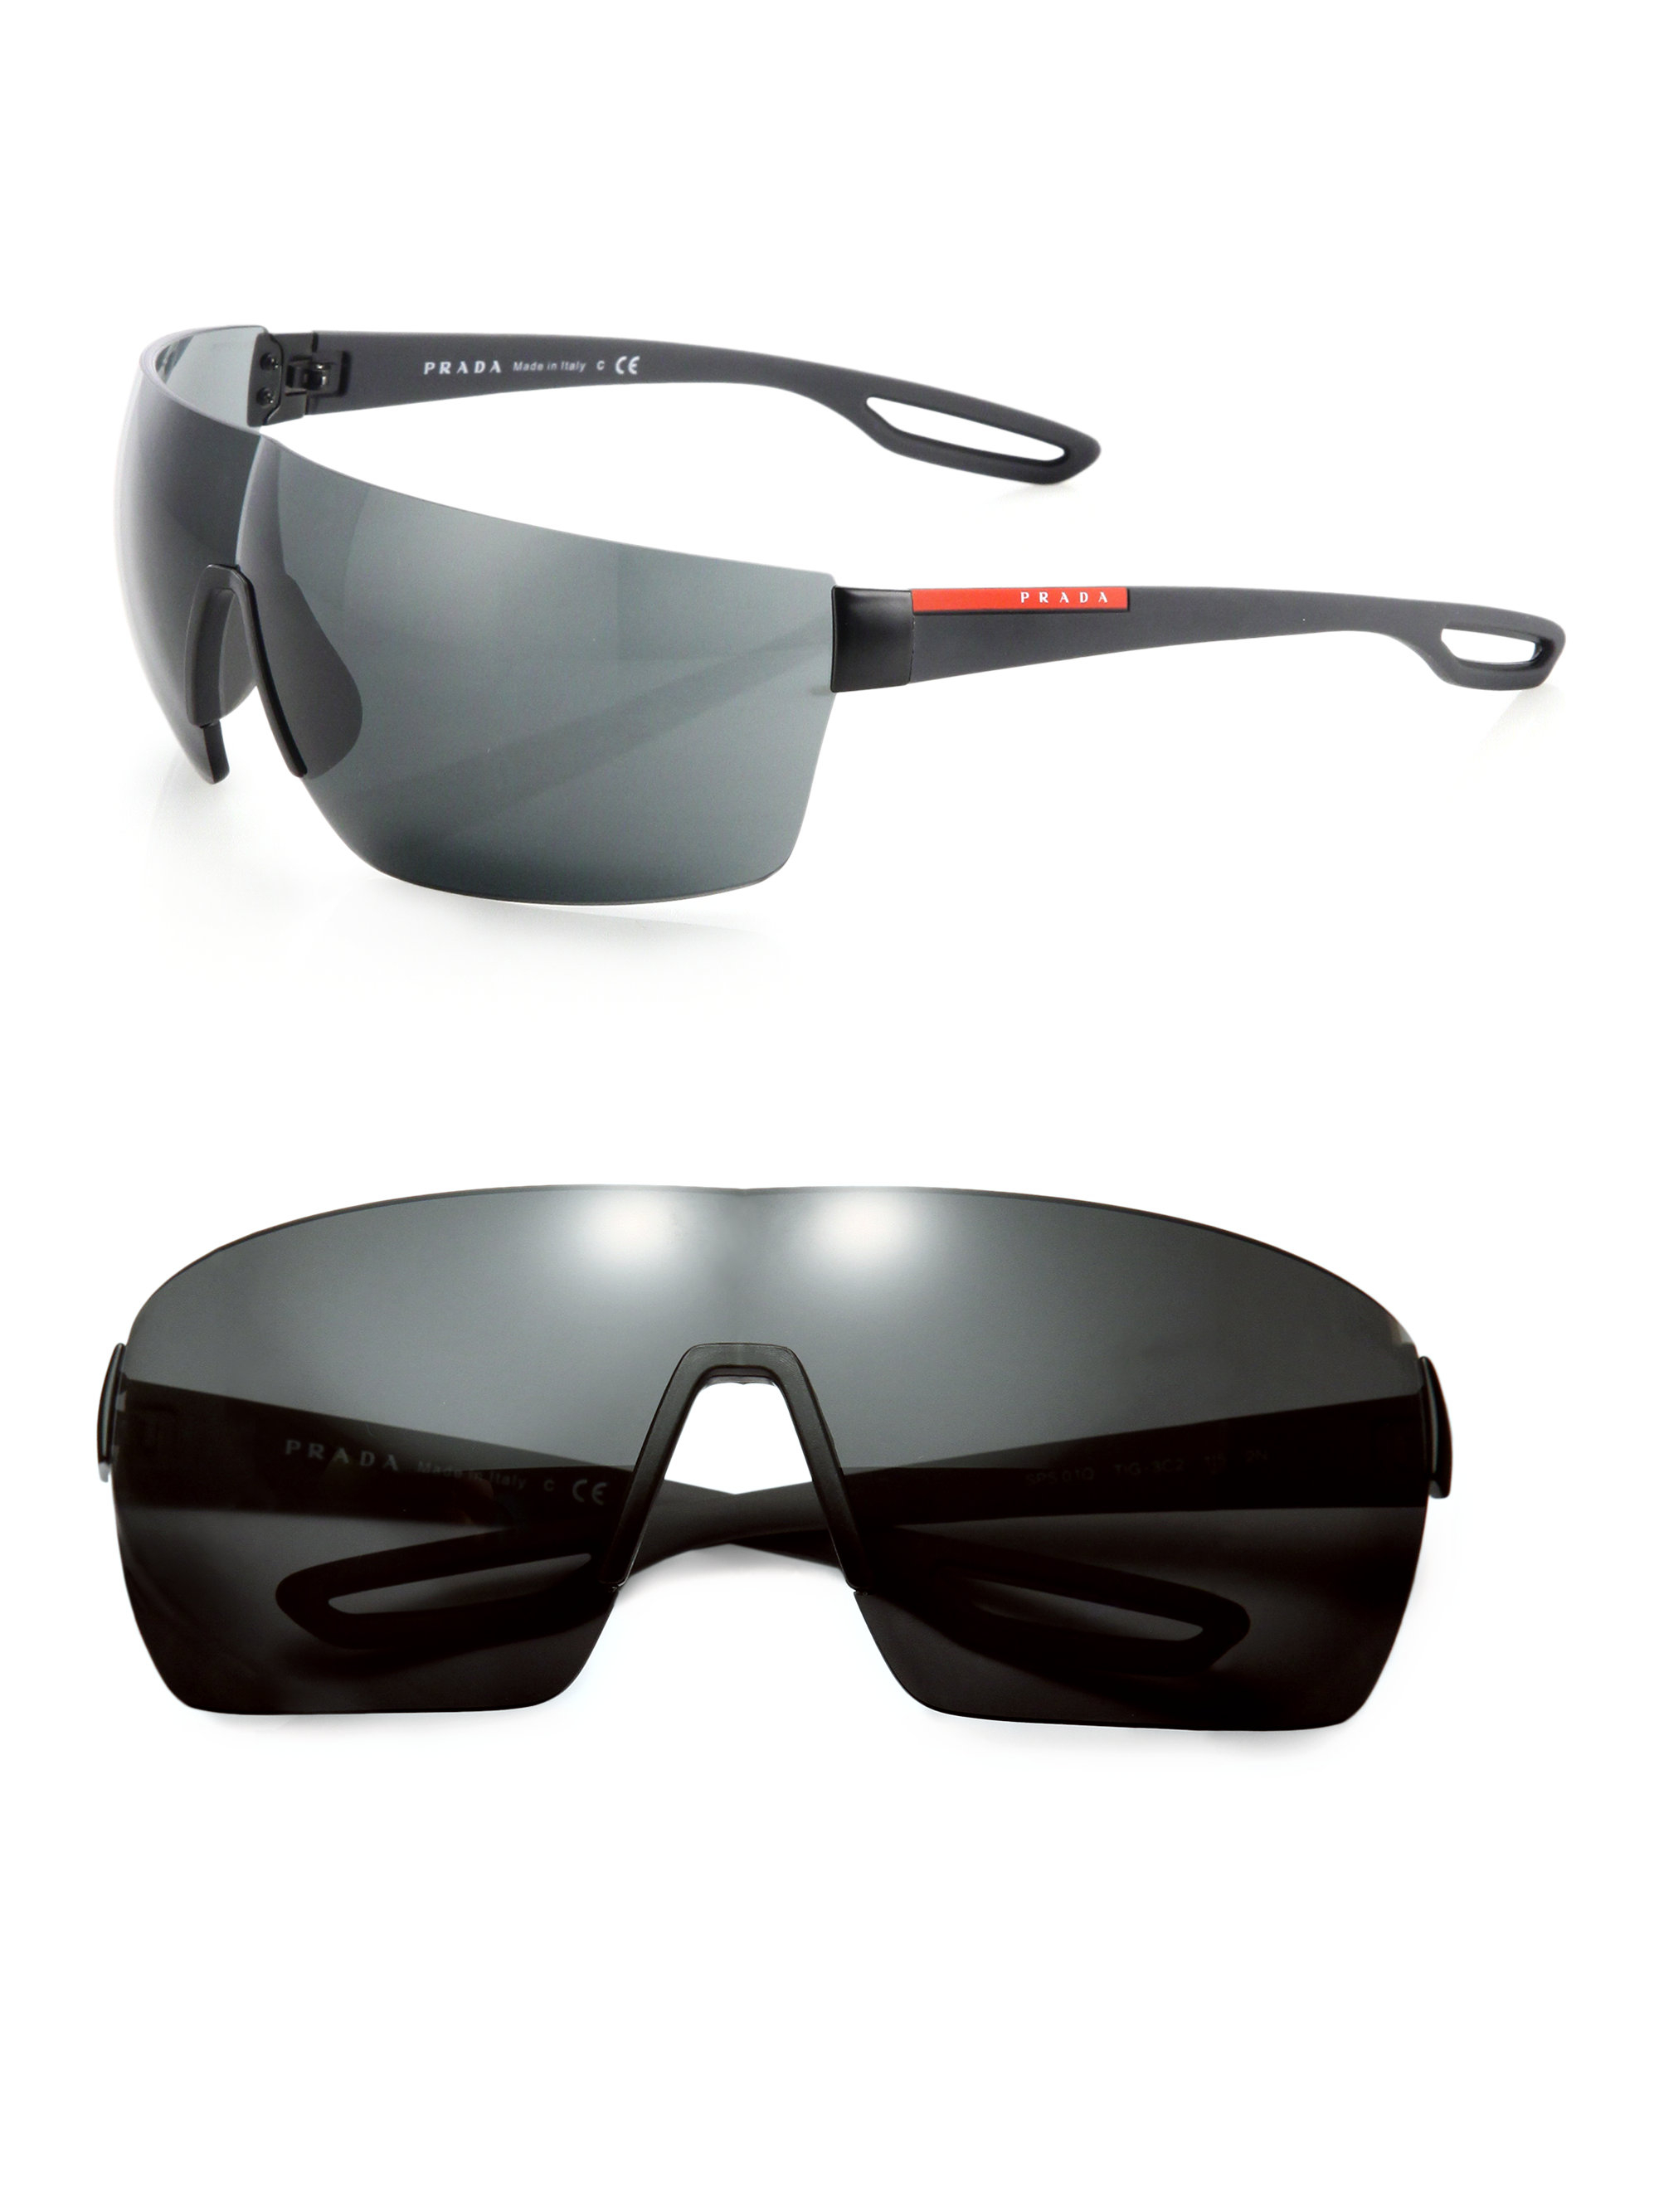 84e0cc80cd77 ... australia lyst prada 38mm injected rimless rectangle sunglasses in  black for men bd6e1 1bcea